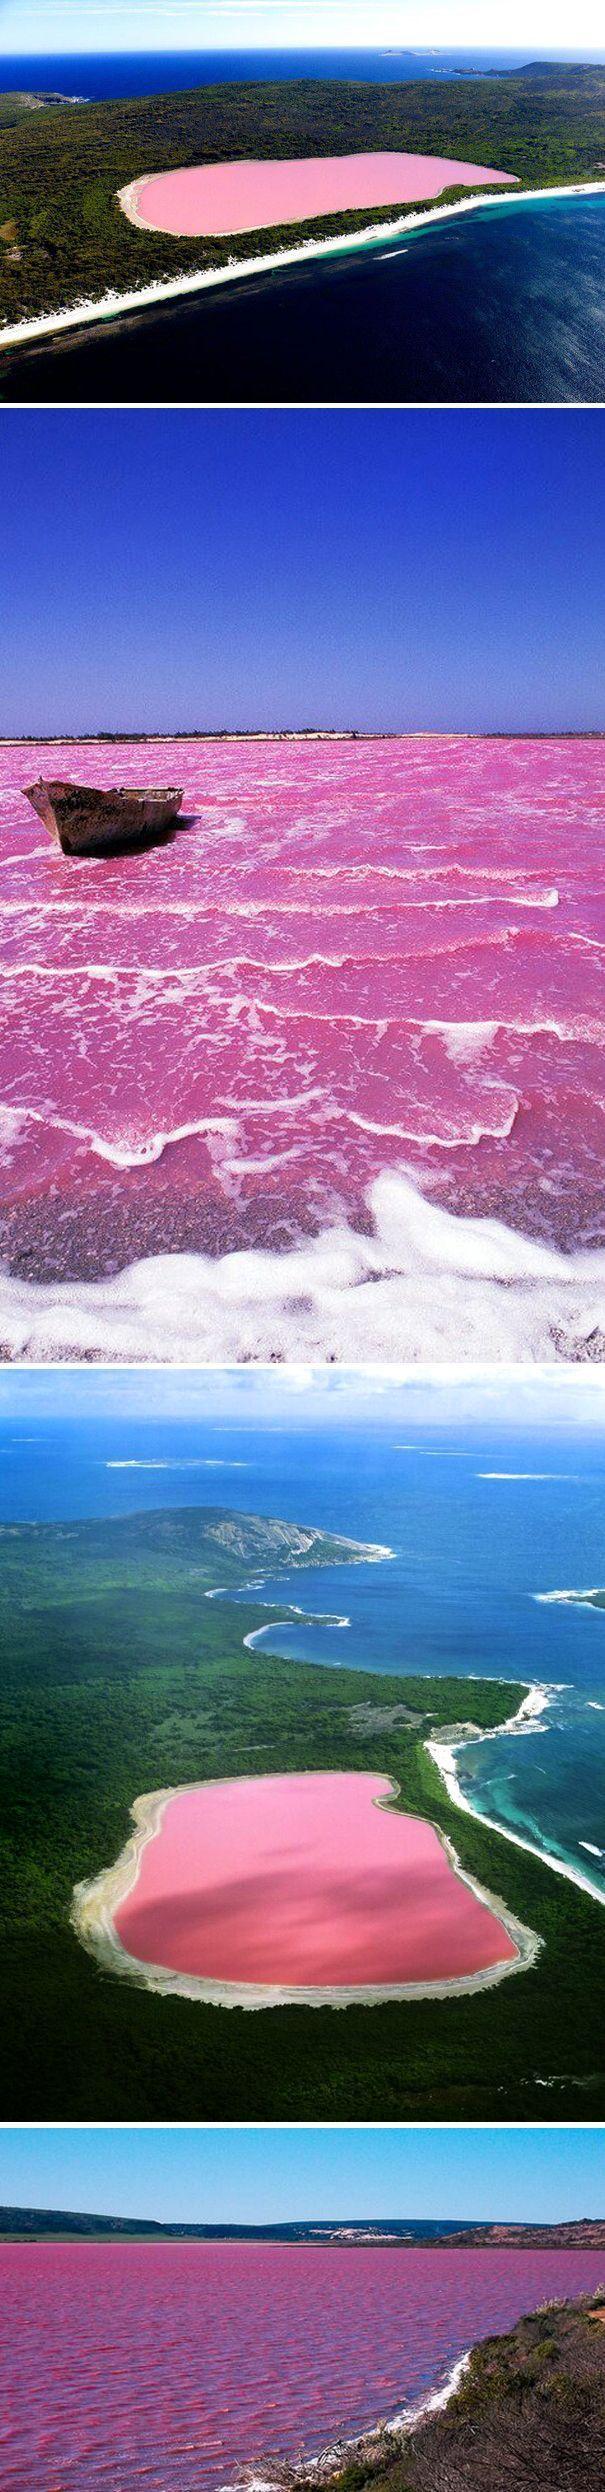 Lake Hillier, Middle Island, Western Australia.